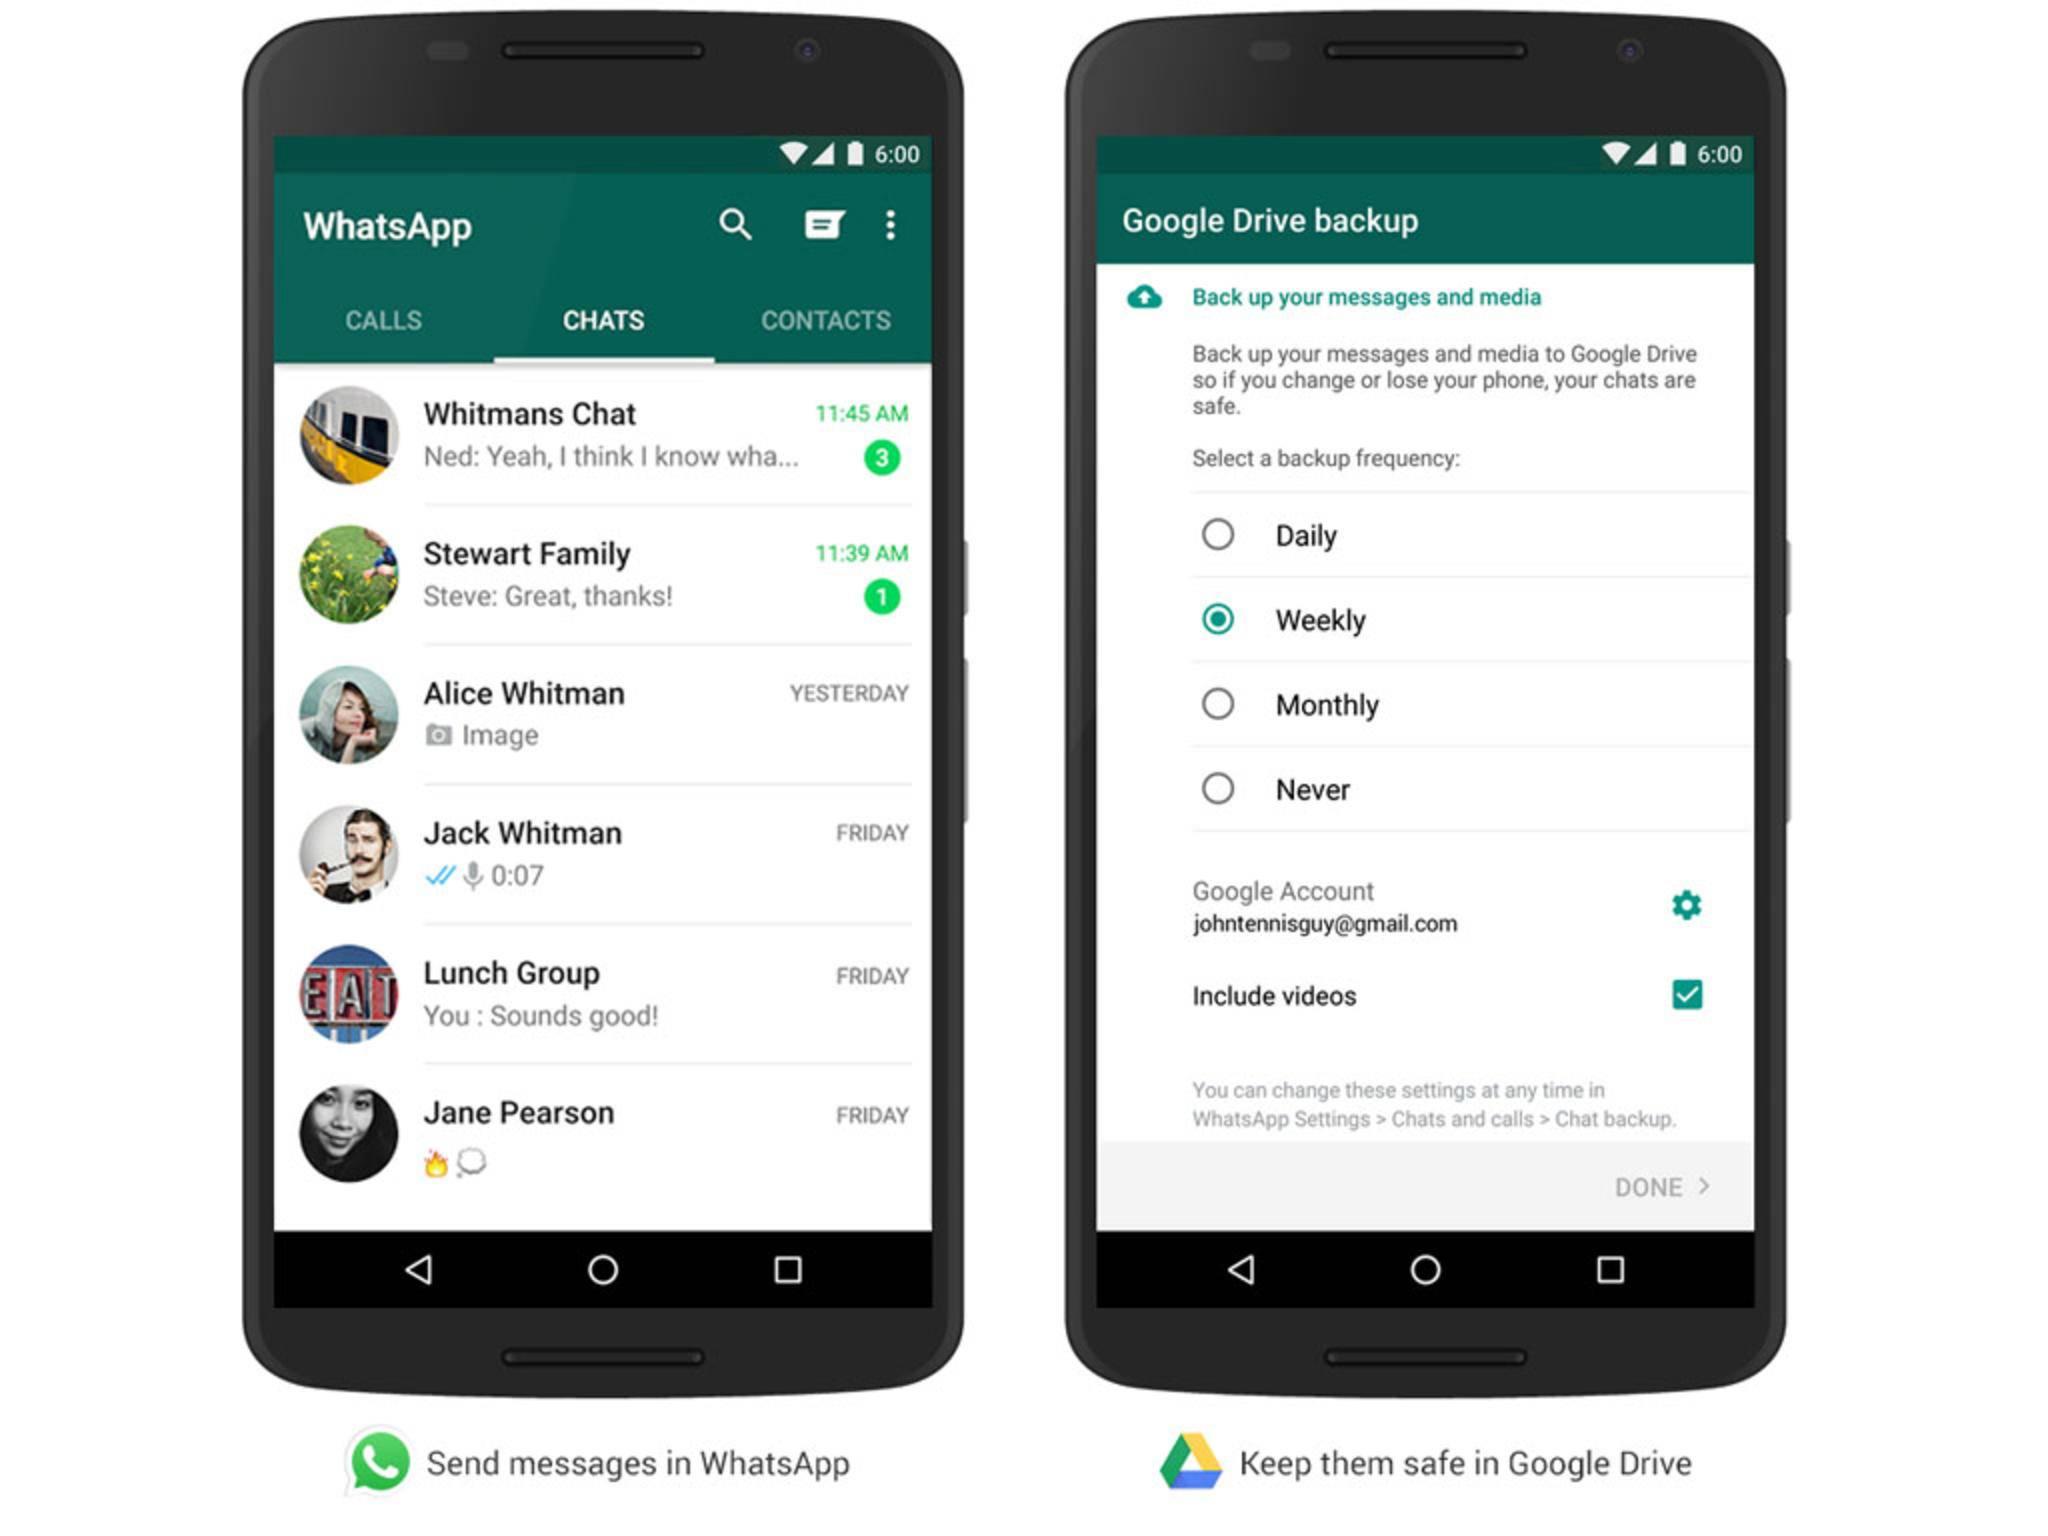 WhatsApp-Backup-Google-Driv